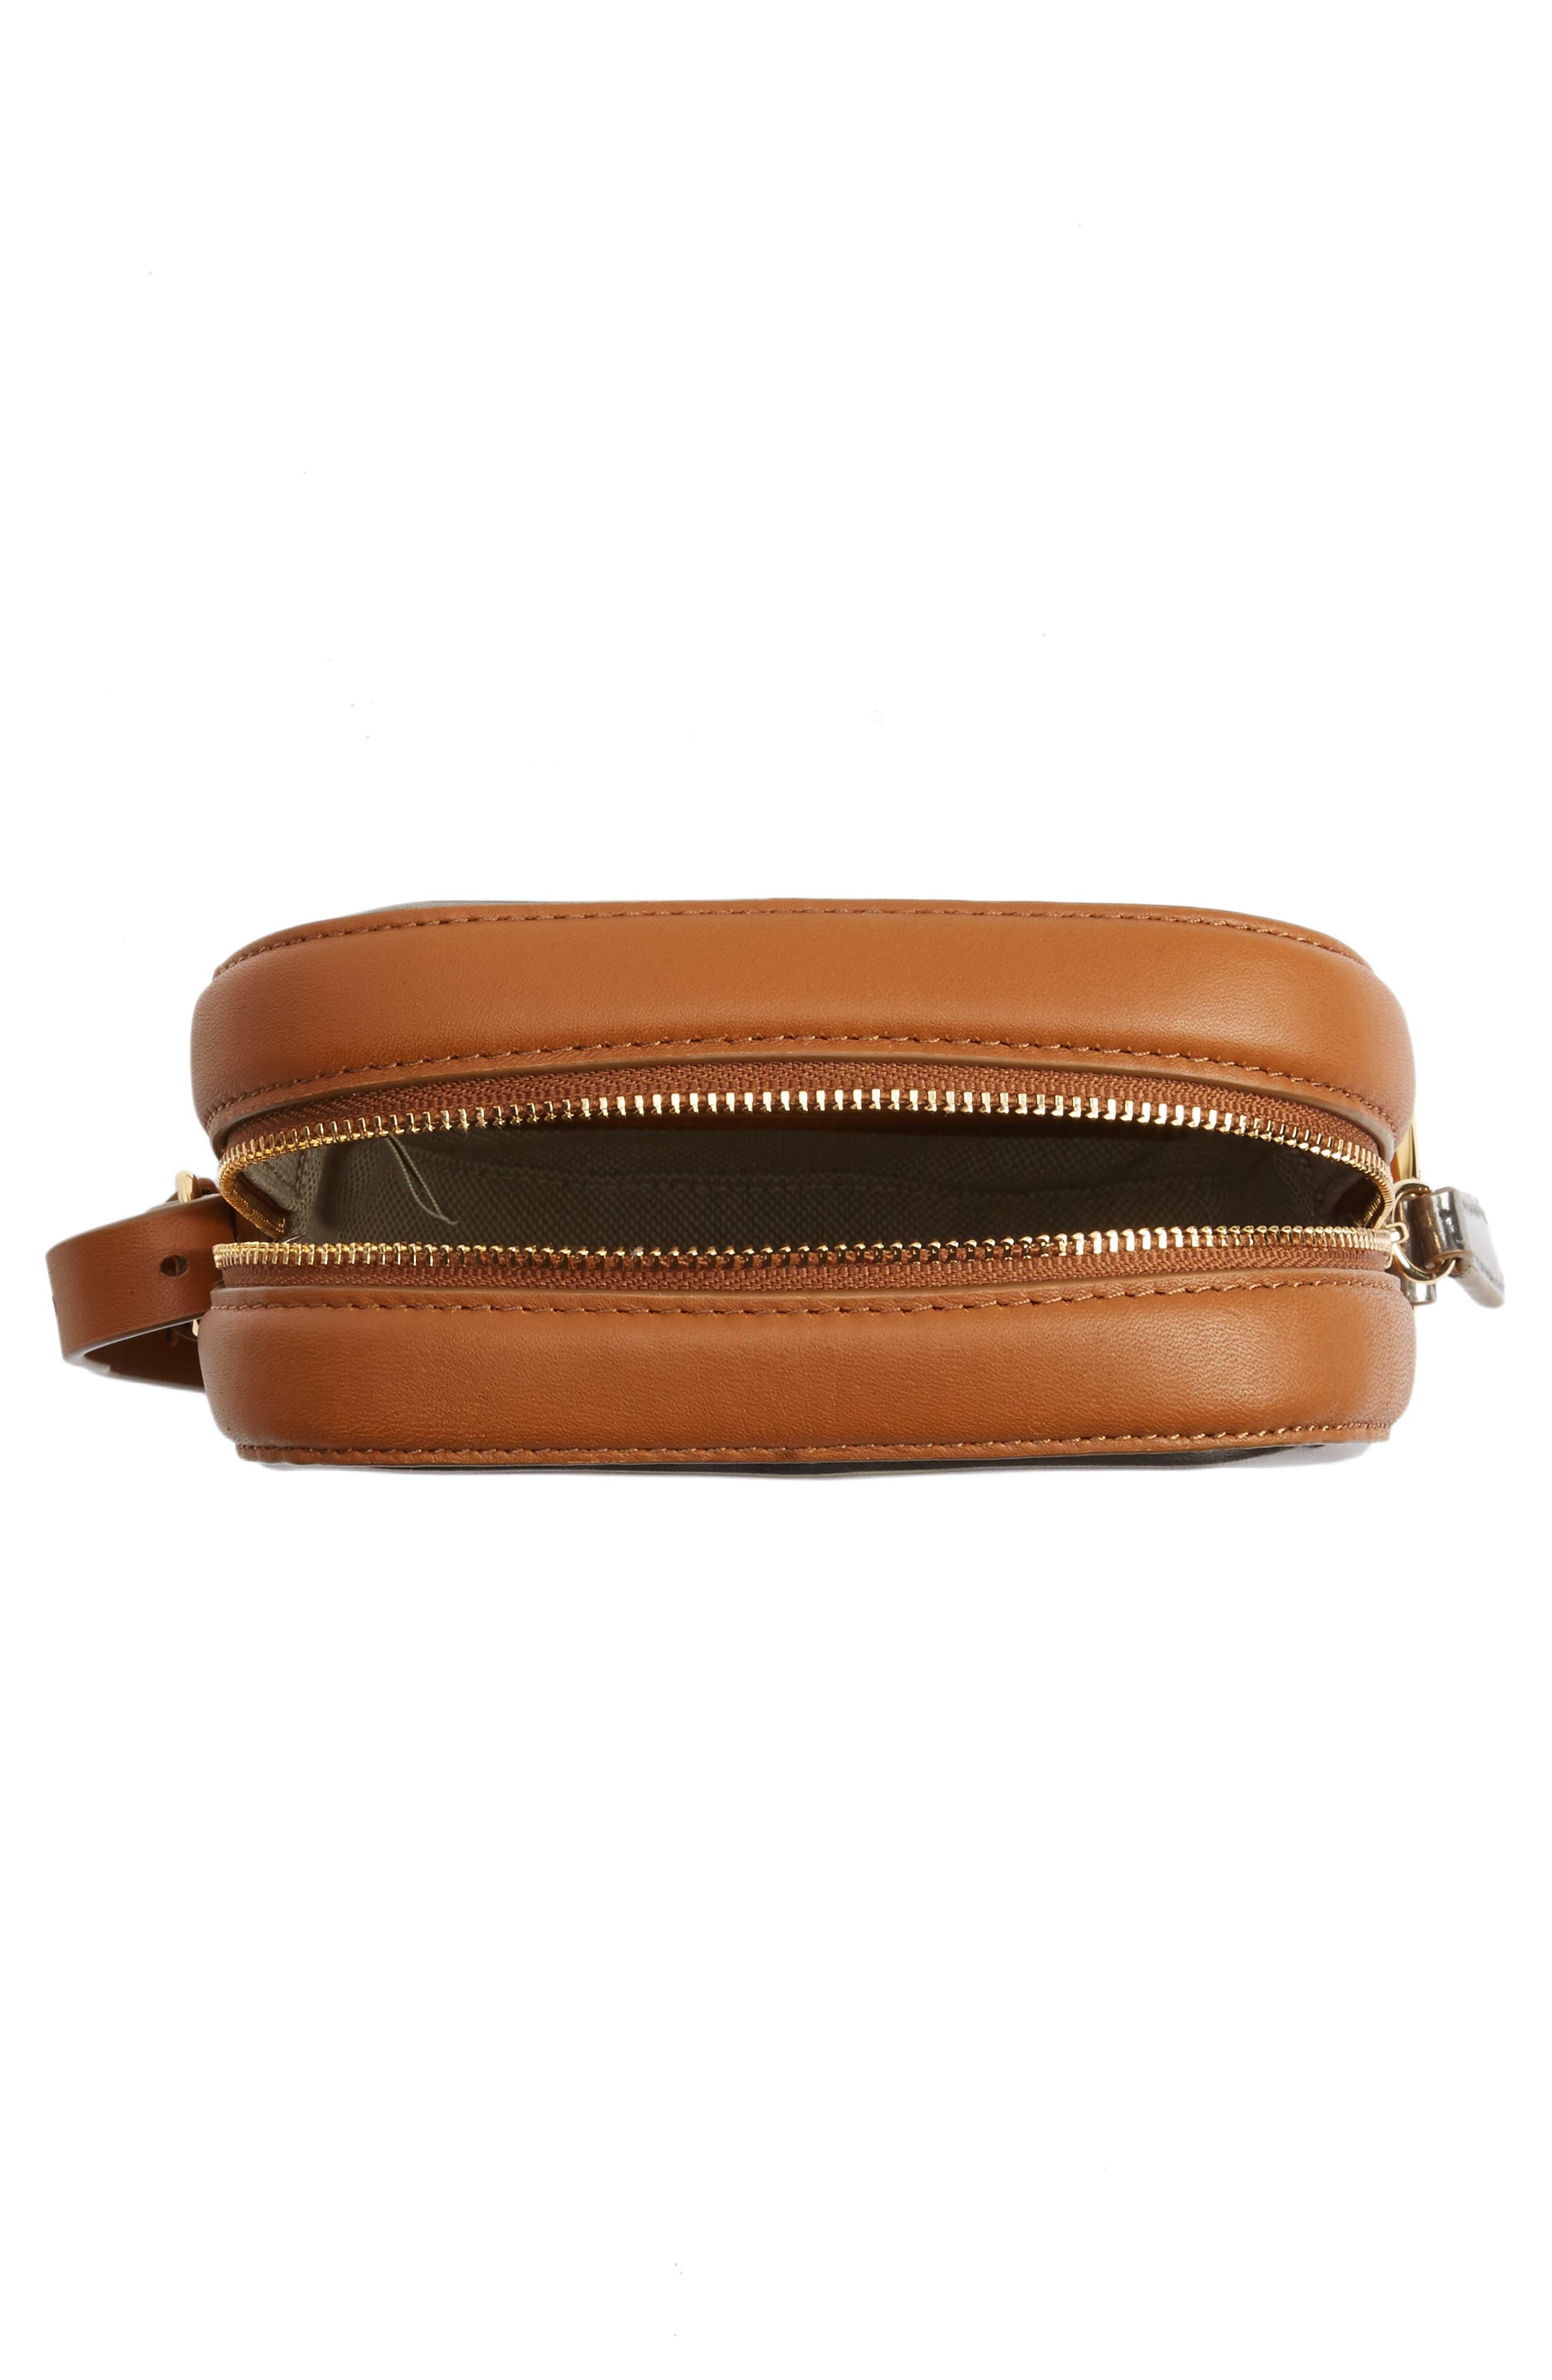 Specchio Leather Camera Bag,                             Alternate thumbnail 4, color,                             040